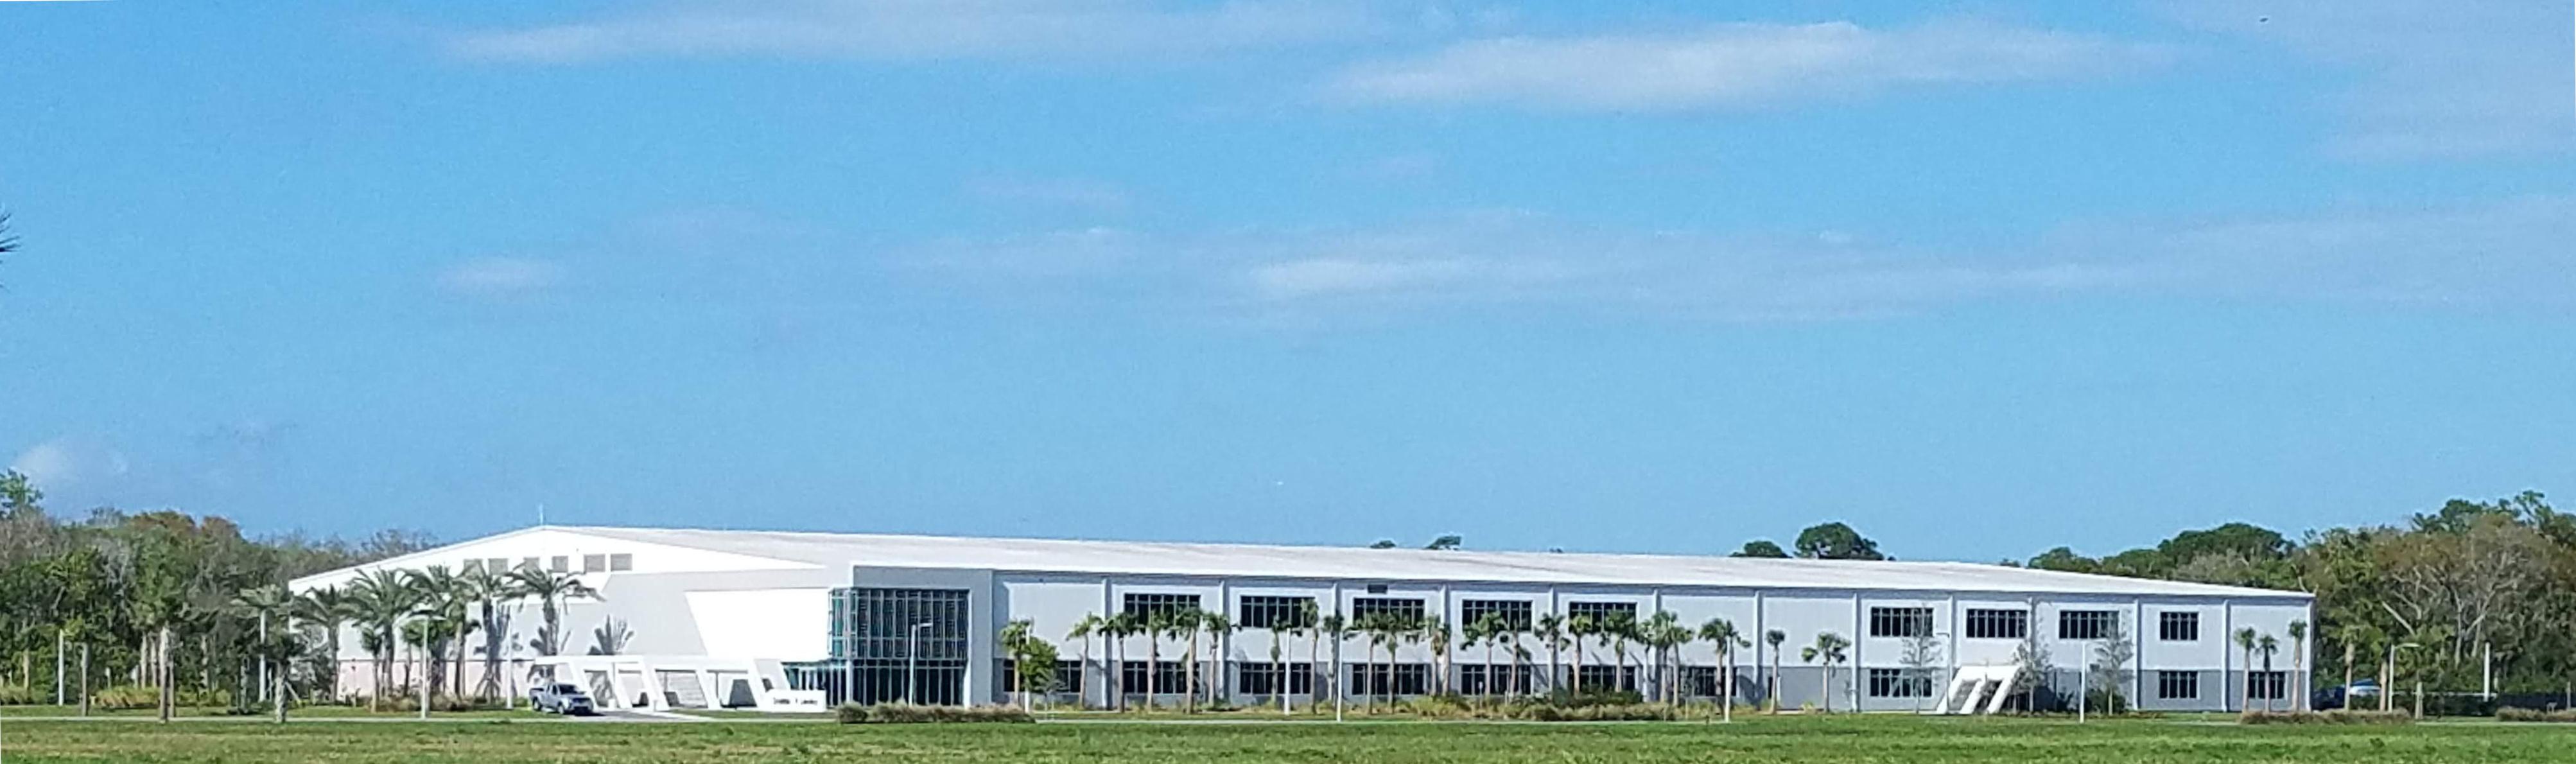 File:OneWeb satellite manufacturing facility, Merritt Island, Florida, 2019 02.jpg